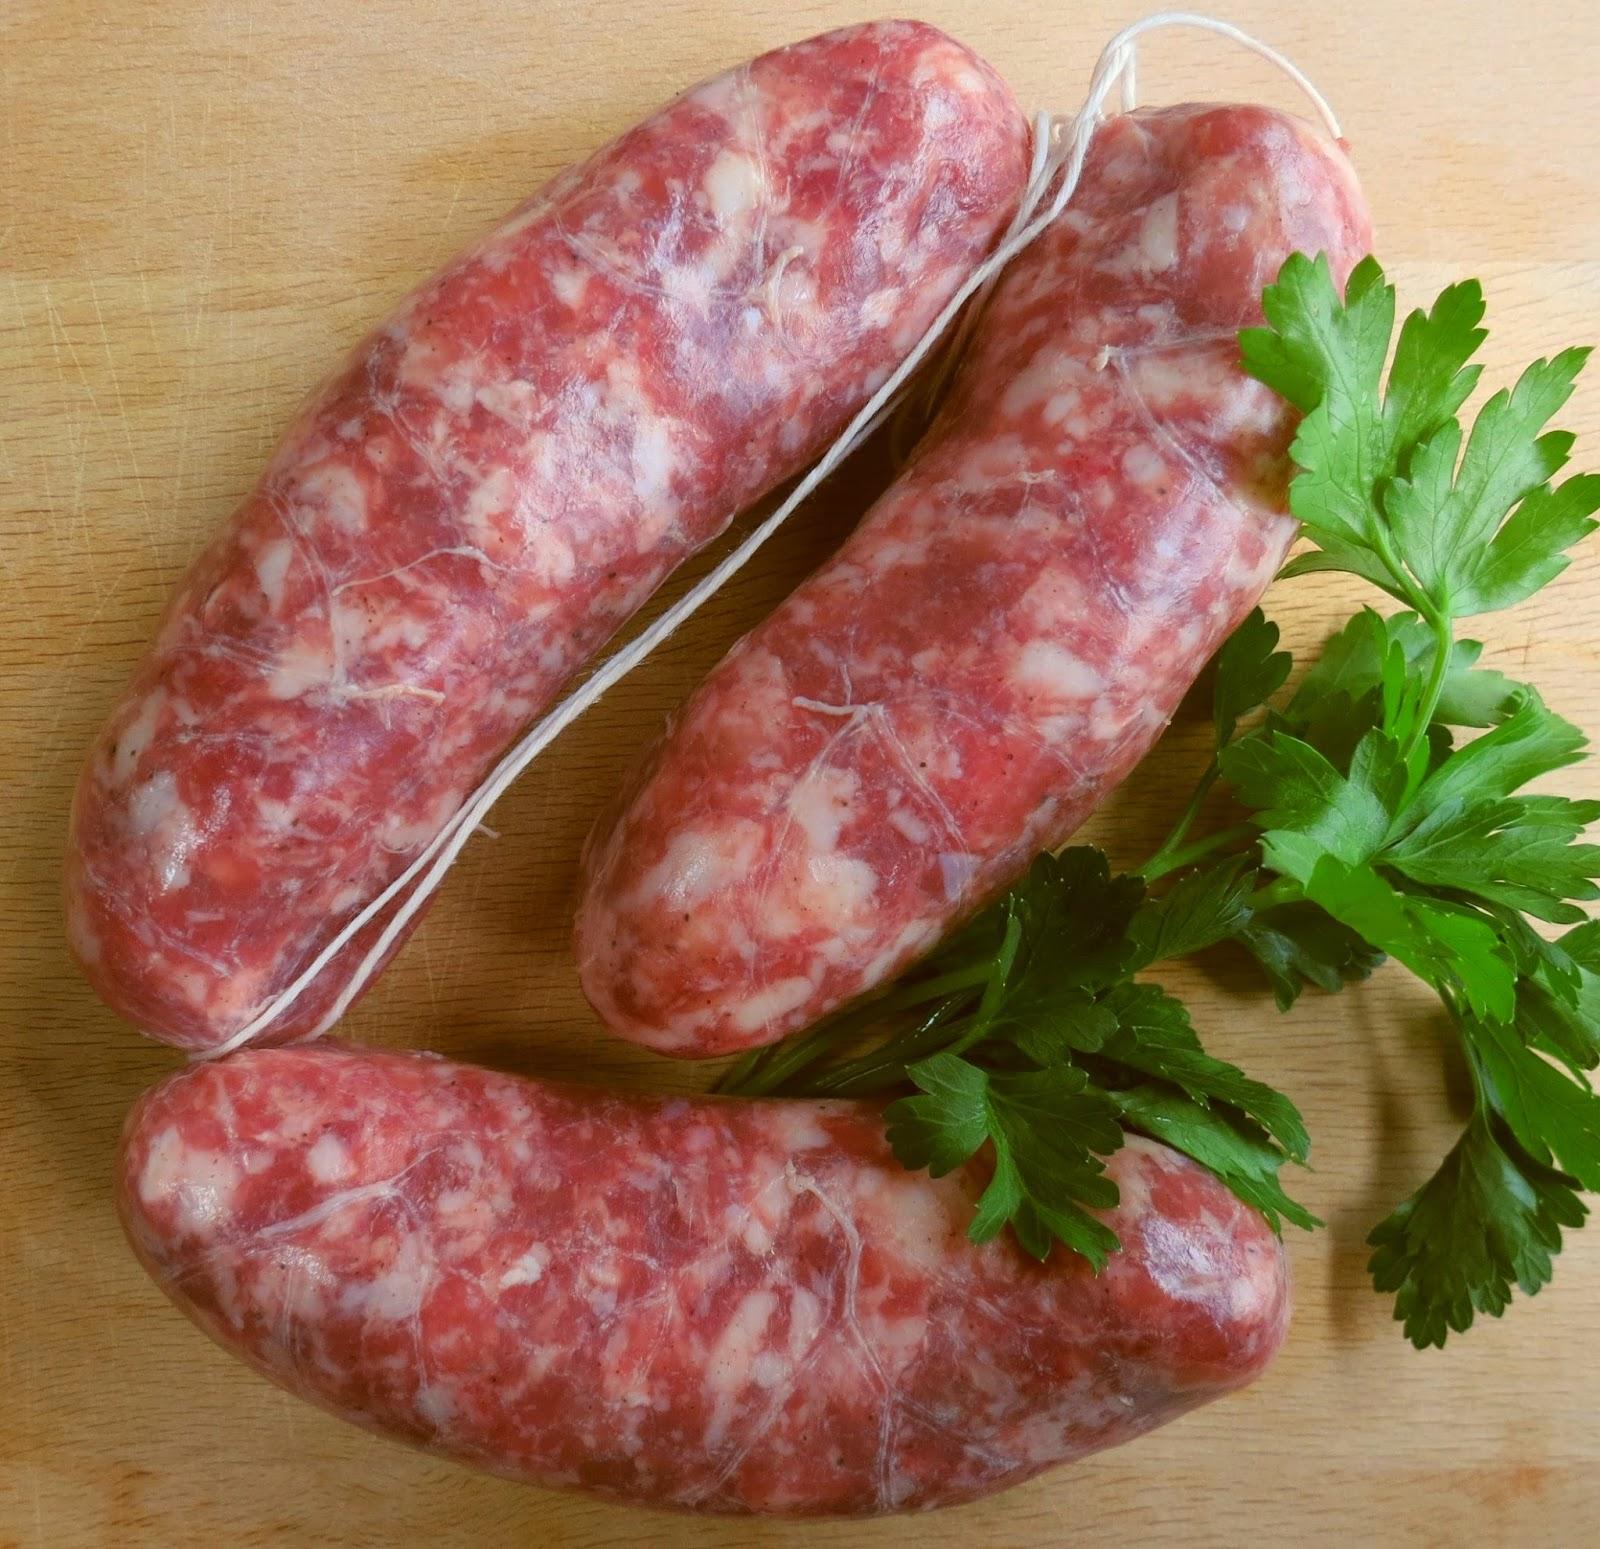 Sausage of Pignone or Salsiccia di Pignone